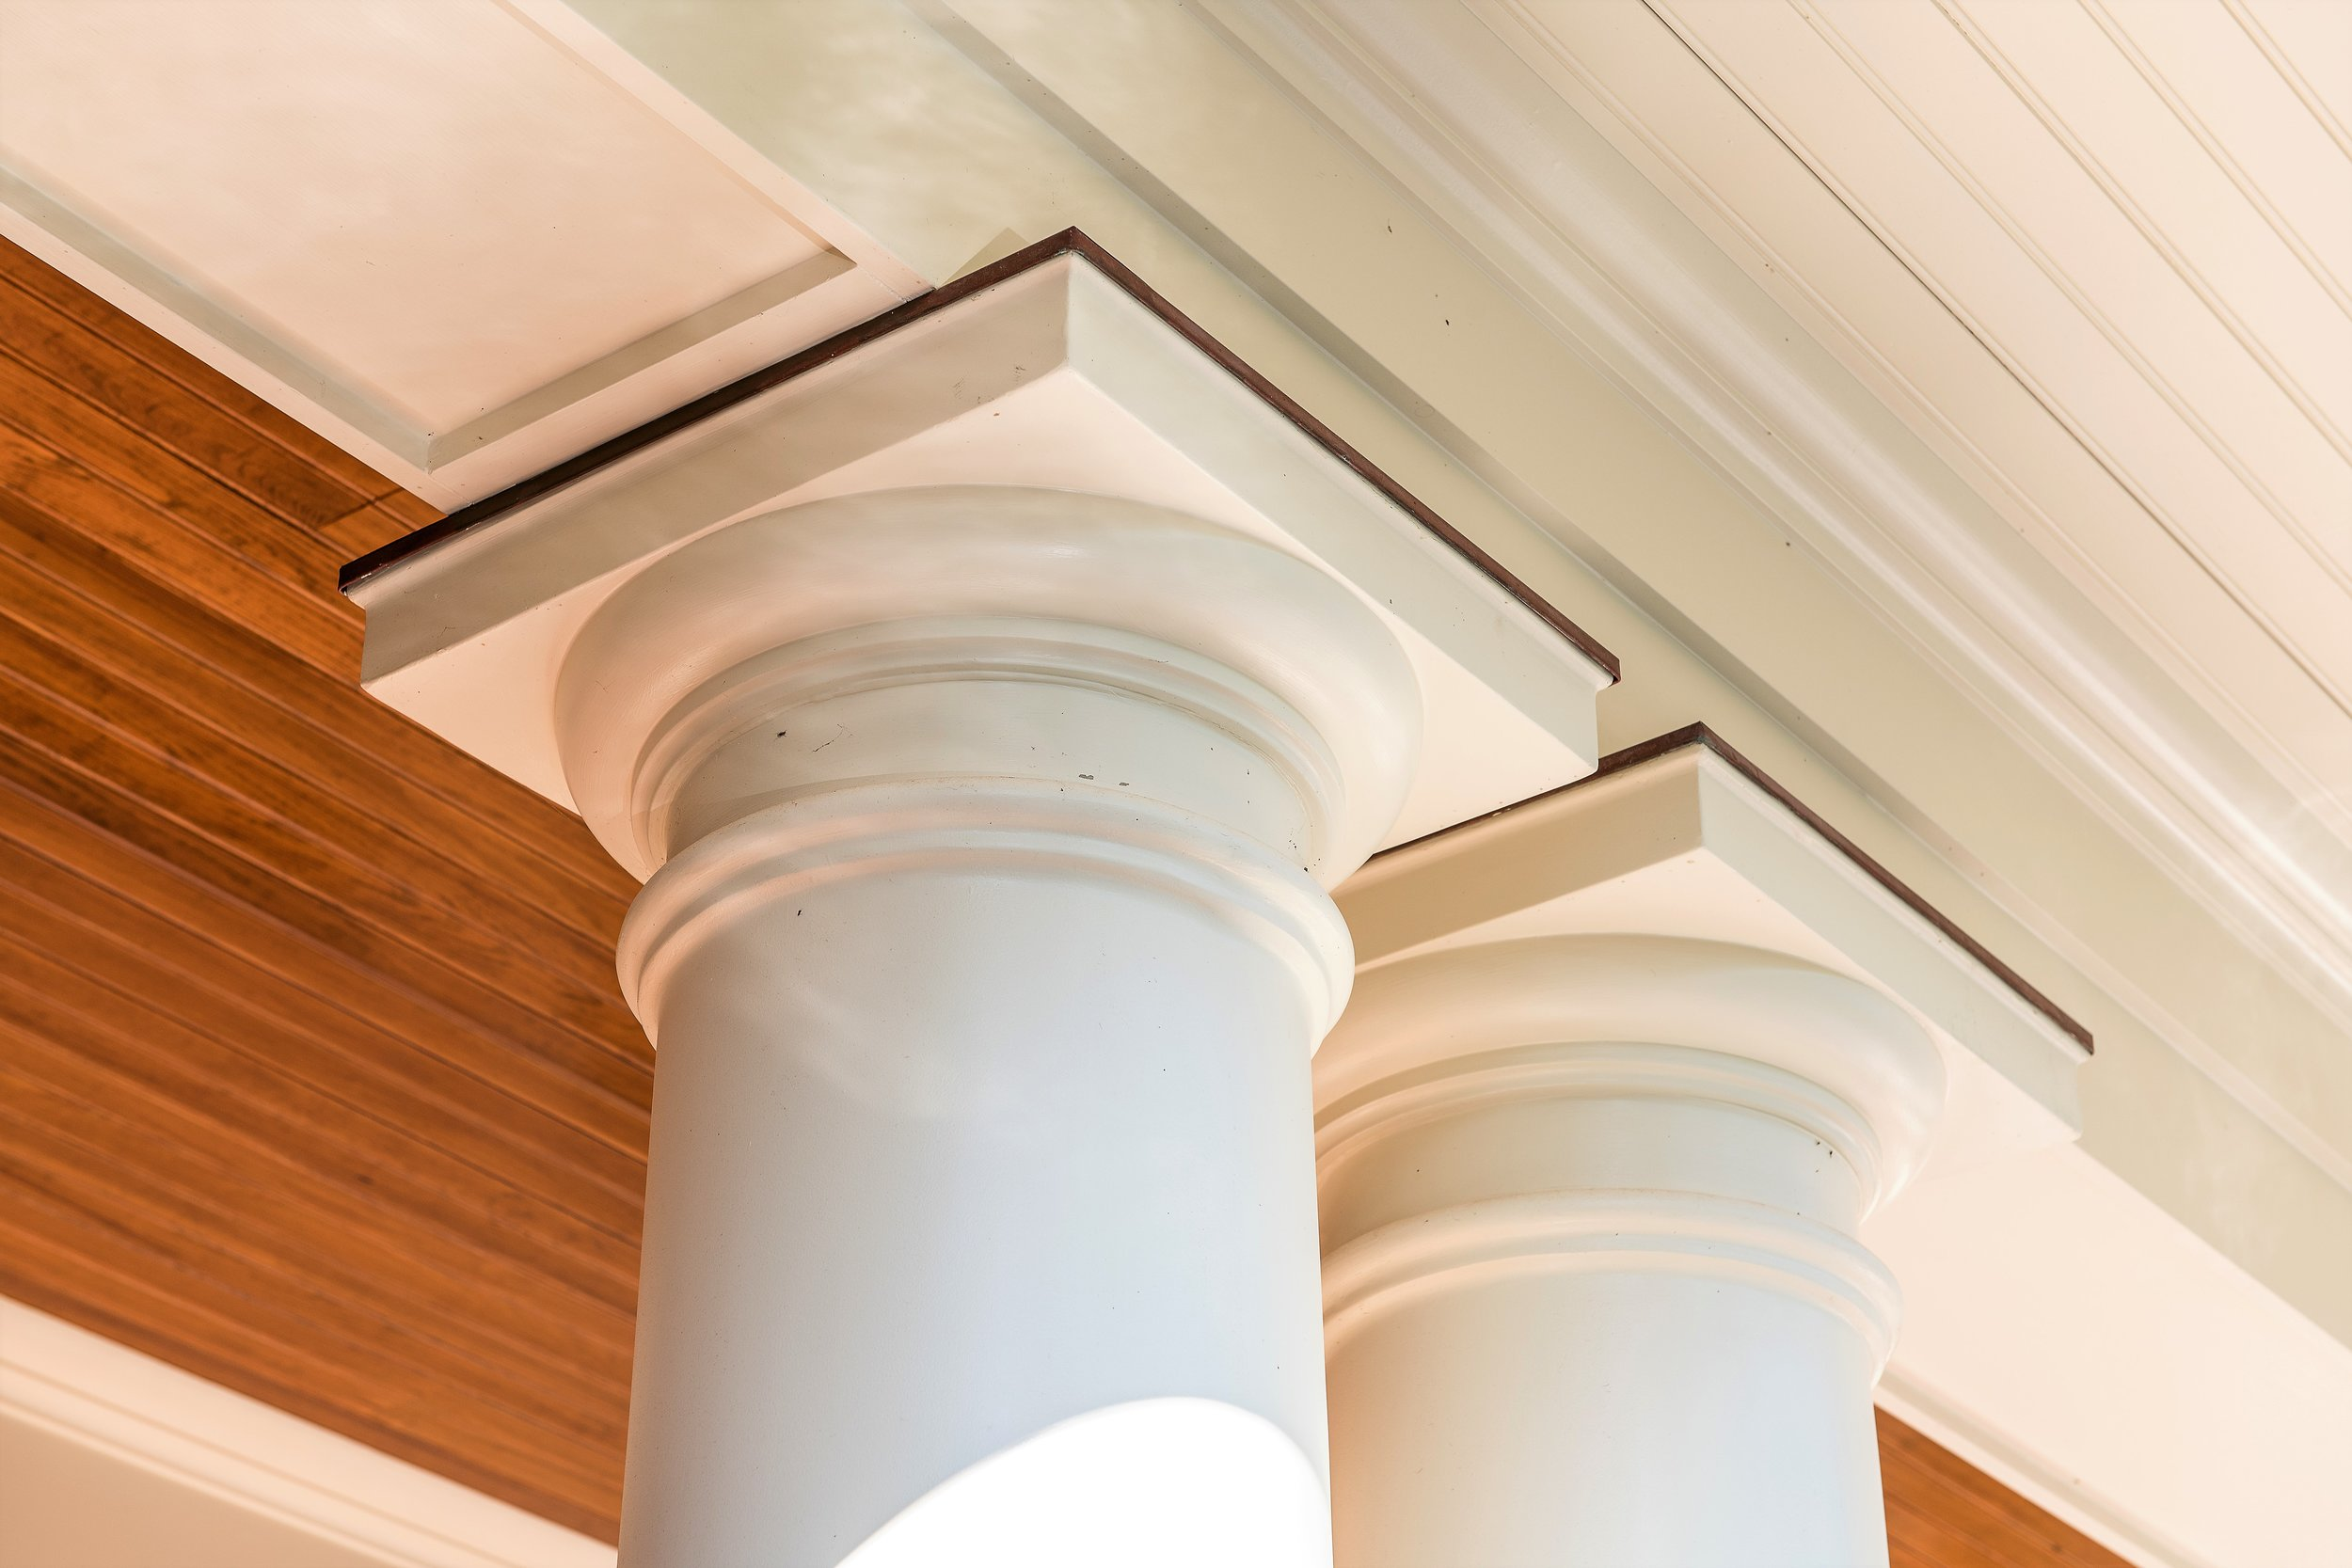 181116-Kiawah-Architecture-Photographer-0024.jpg